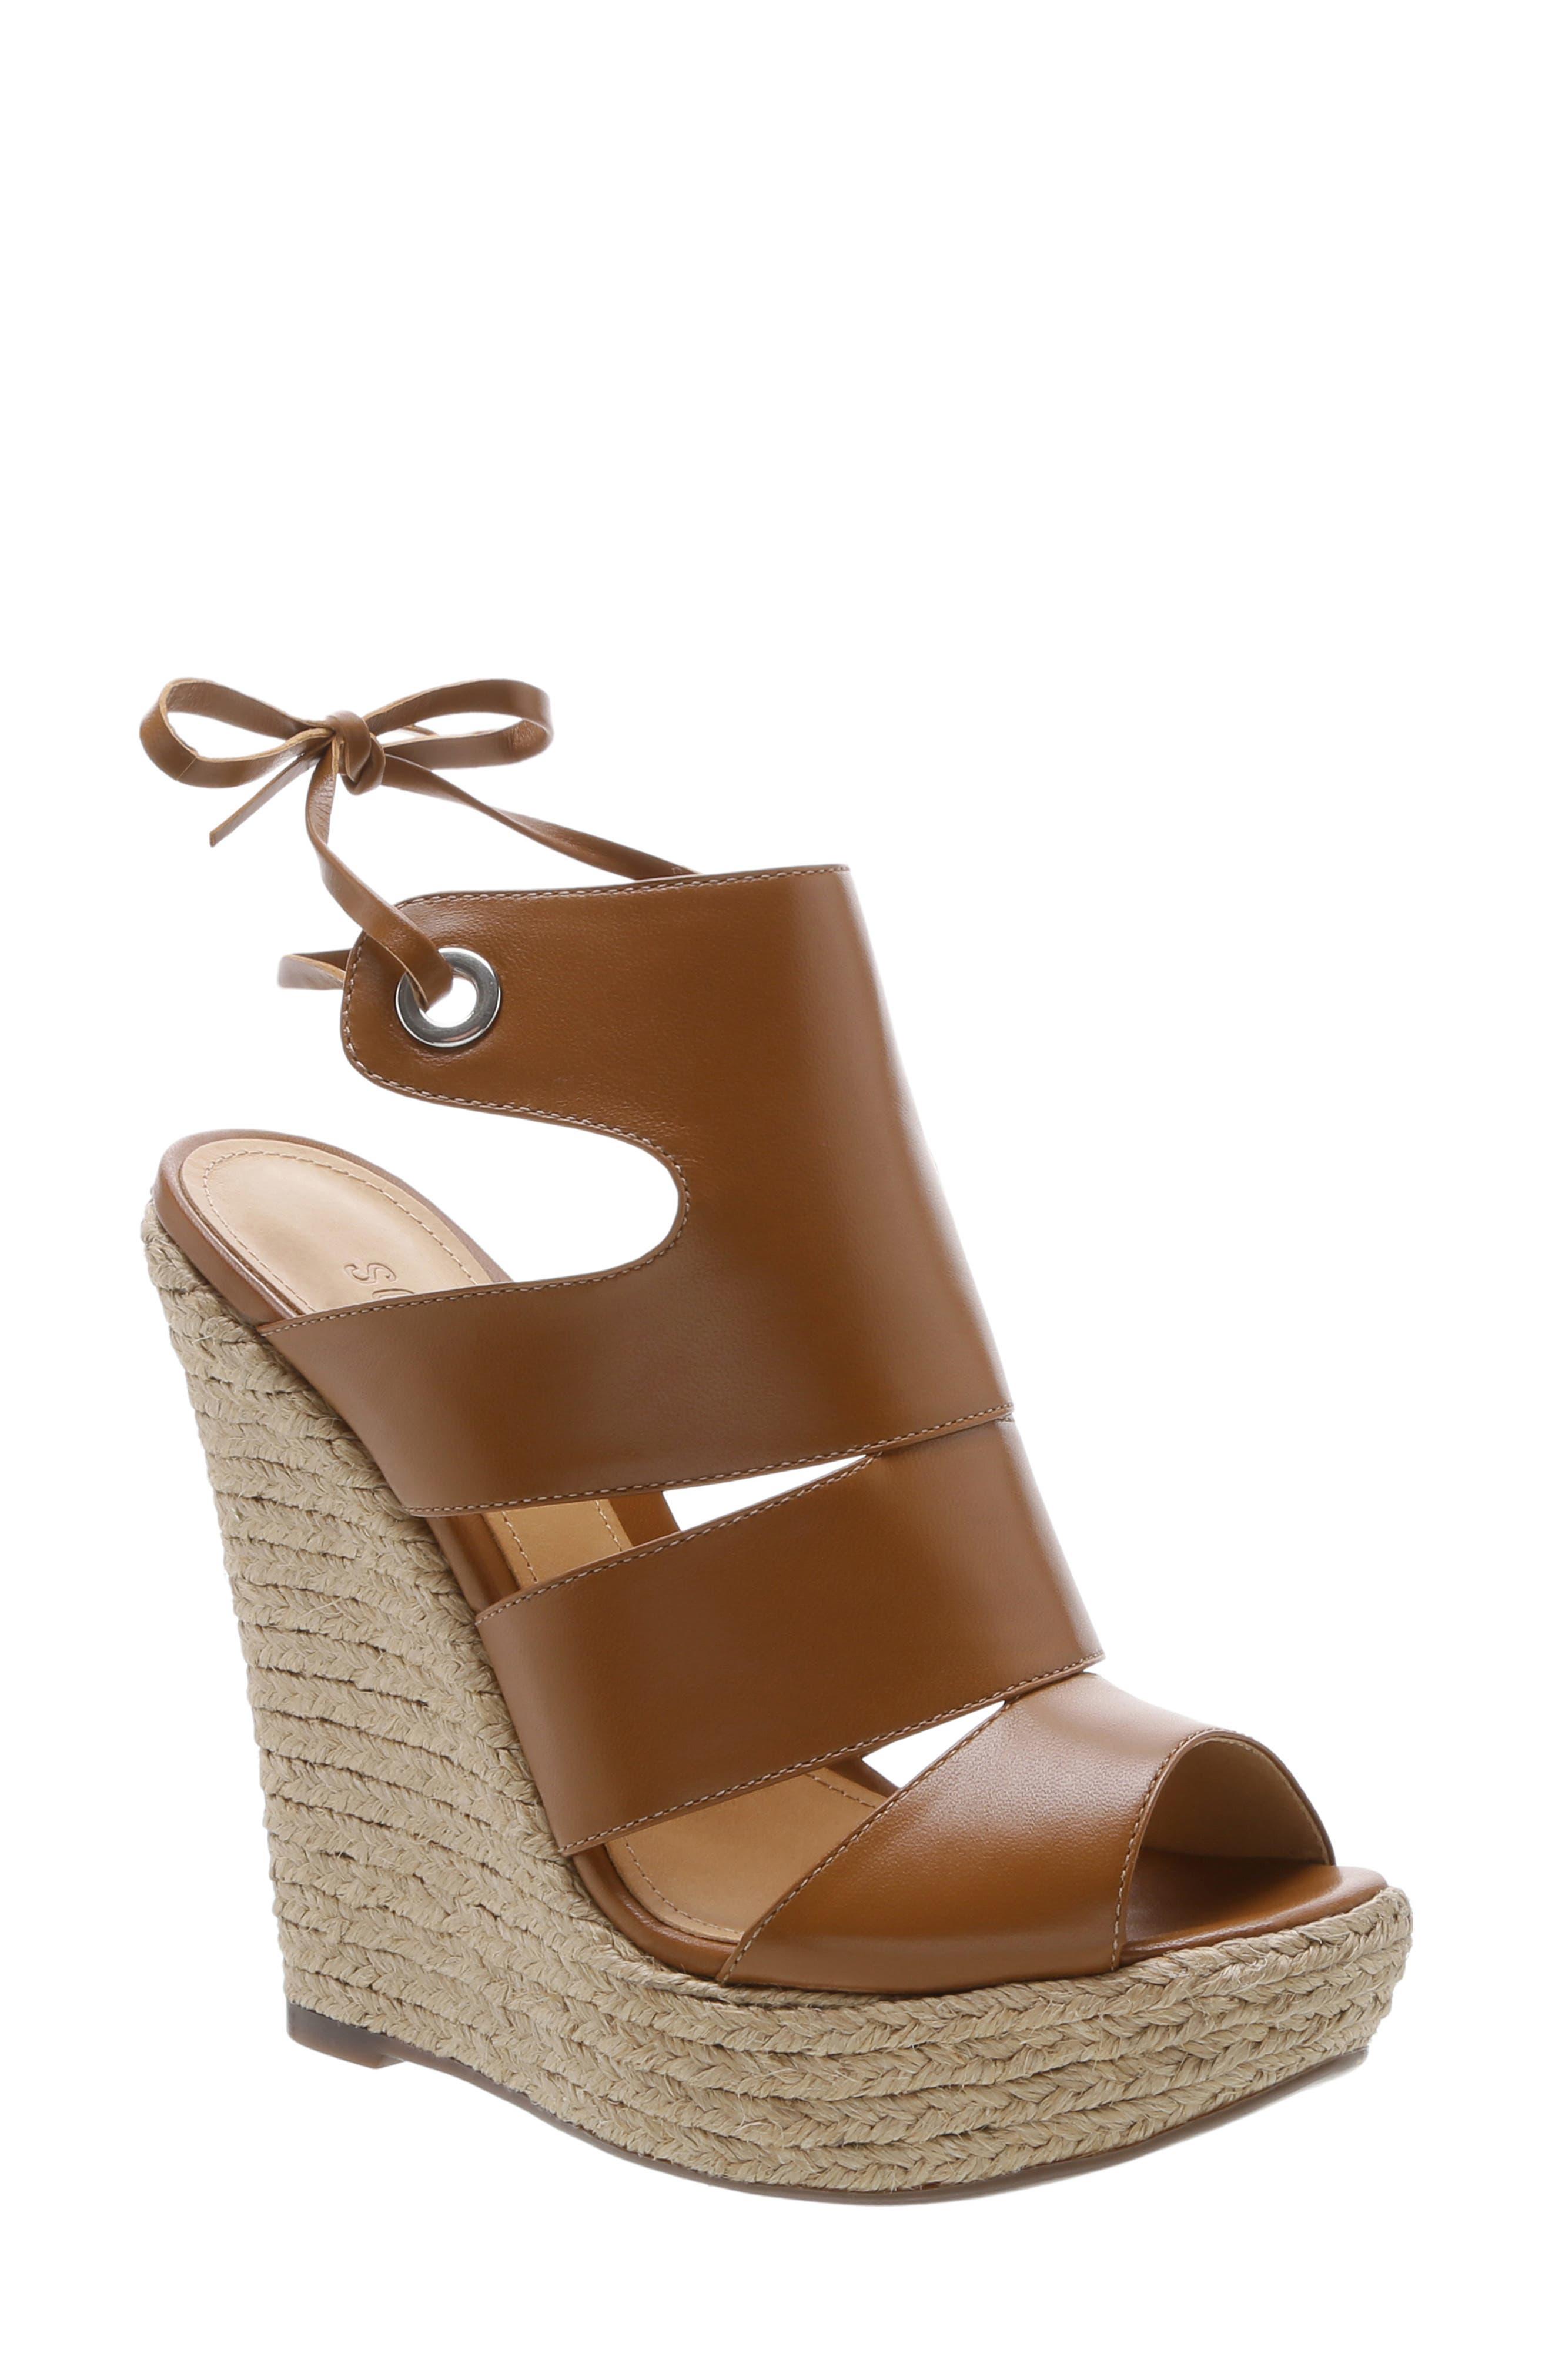 Ilione Platform Wedge Sandal, Main, color, WOOD LEATHER